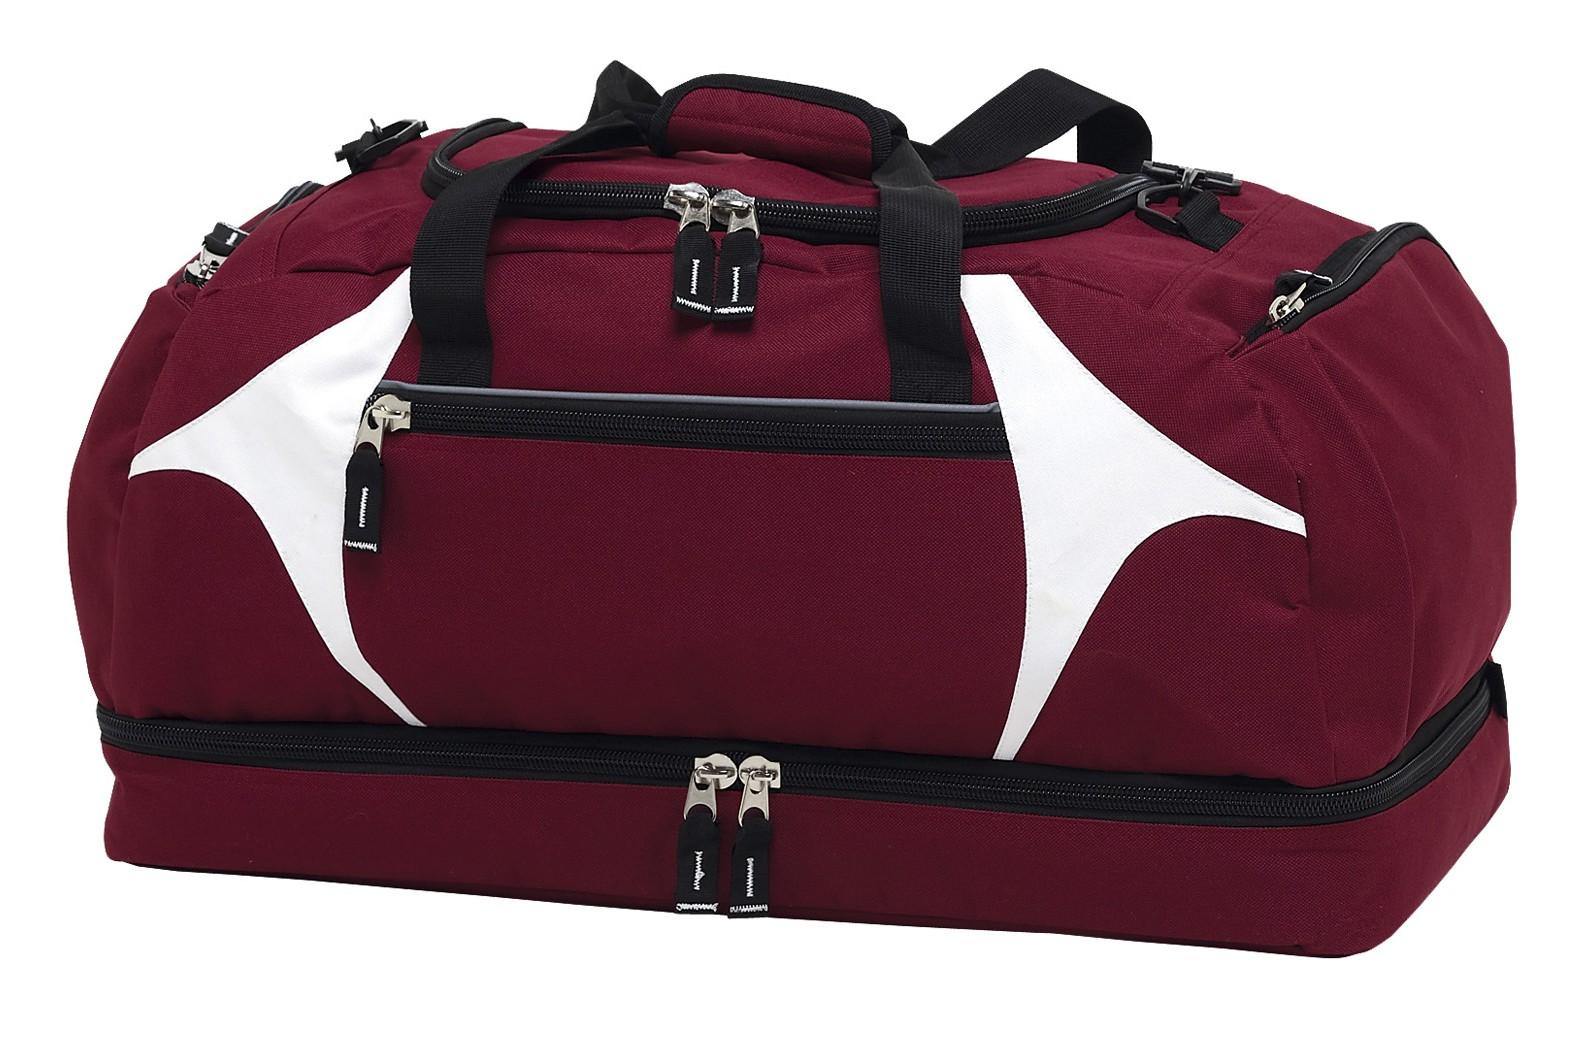 Spliced Zenith Sports Bag - Maroon & White